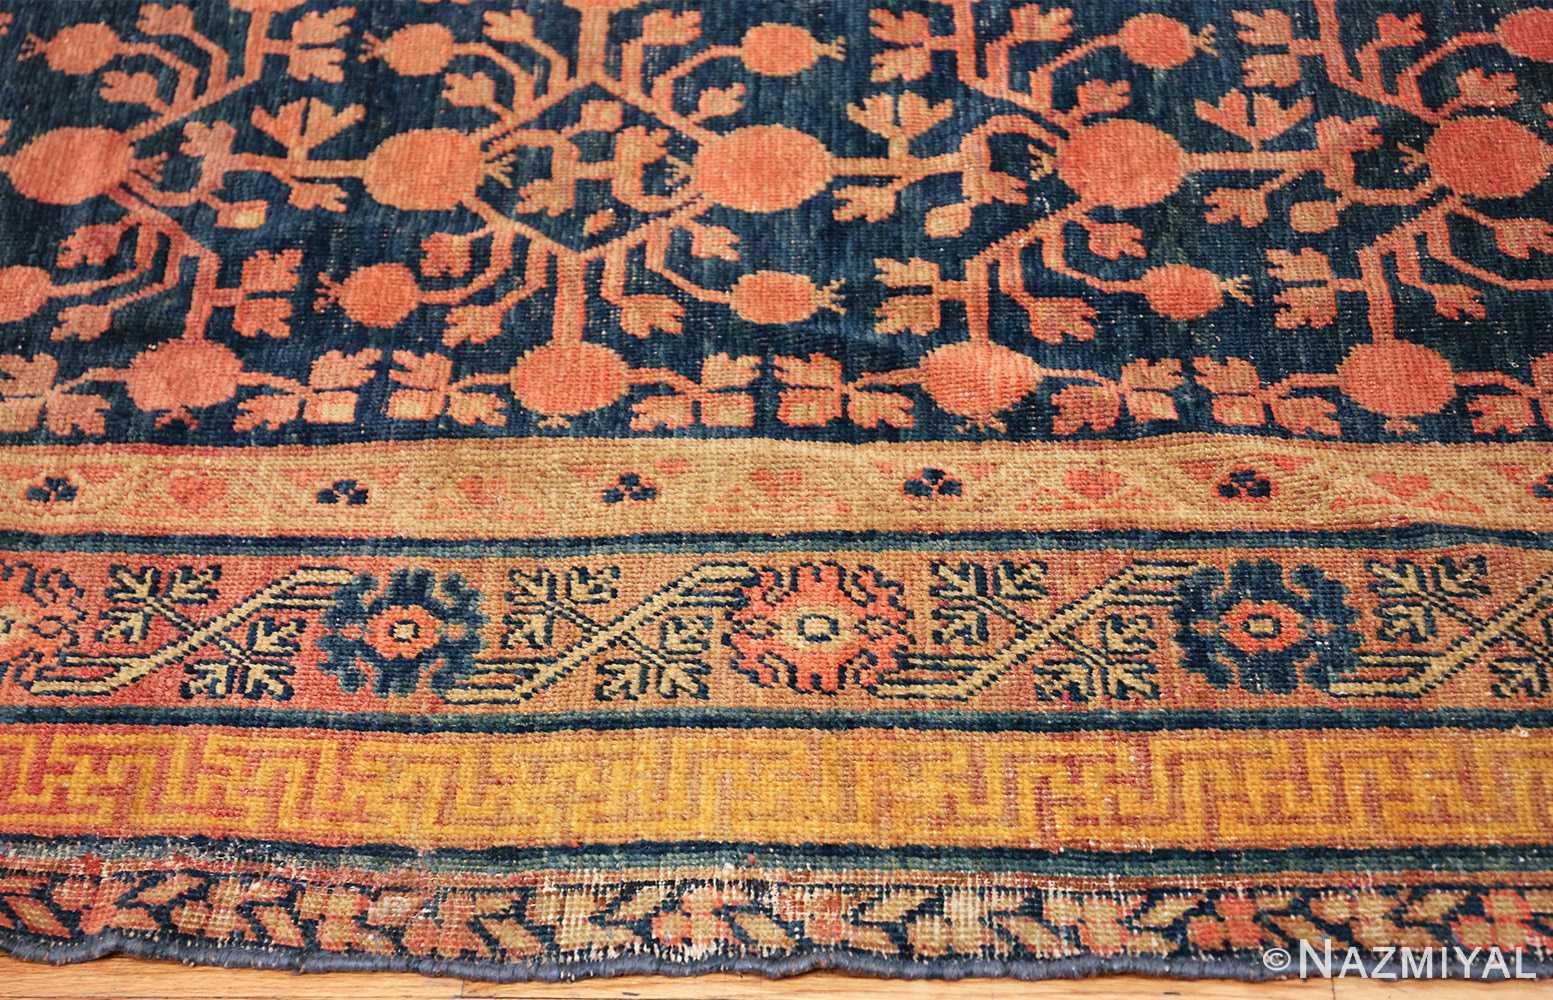 antique navy background pomegranate design khotan rug 49483 border Nazmiyal